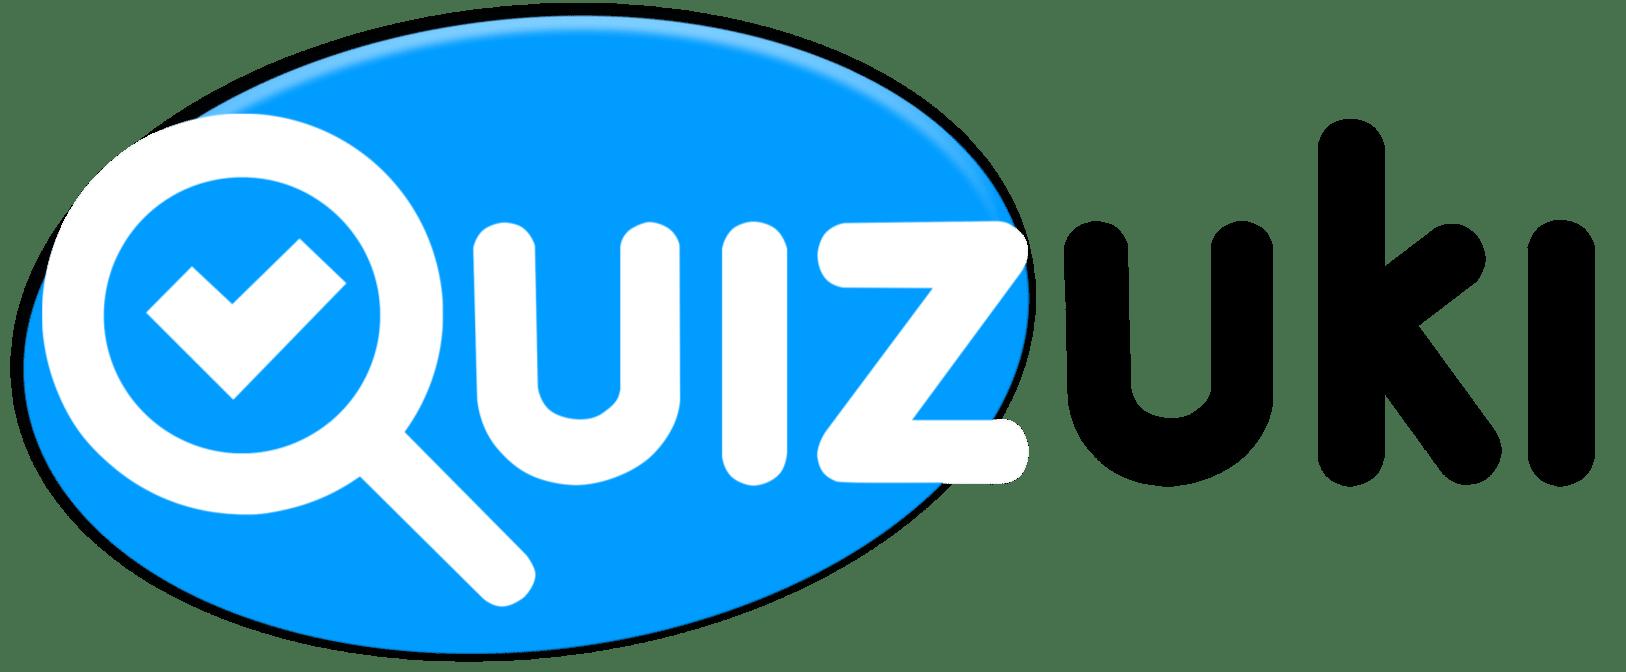 quizuki